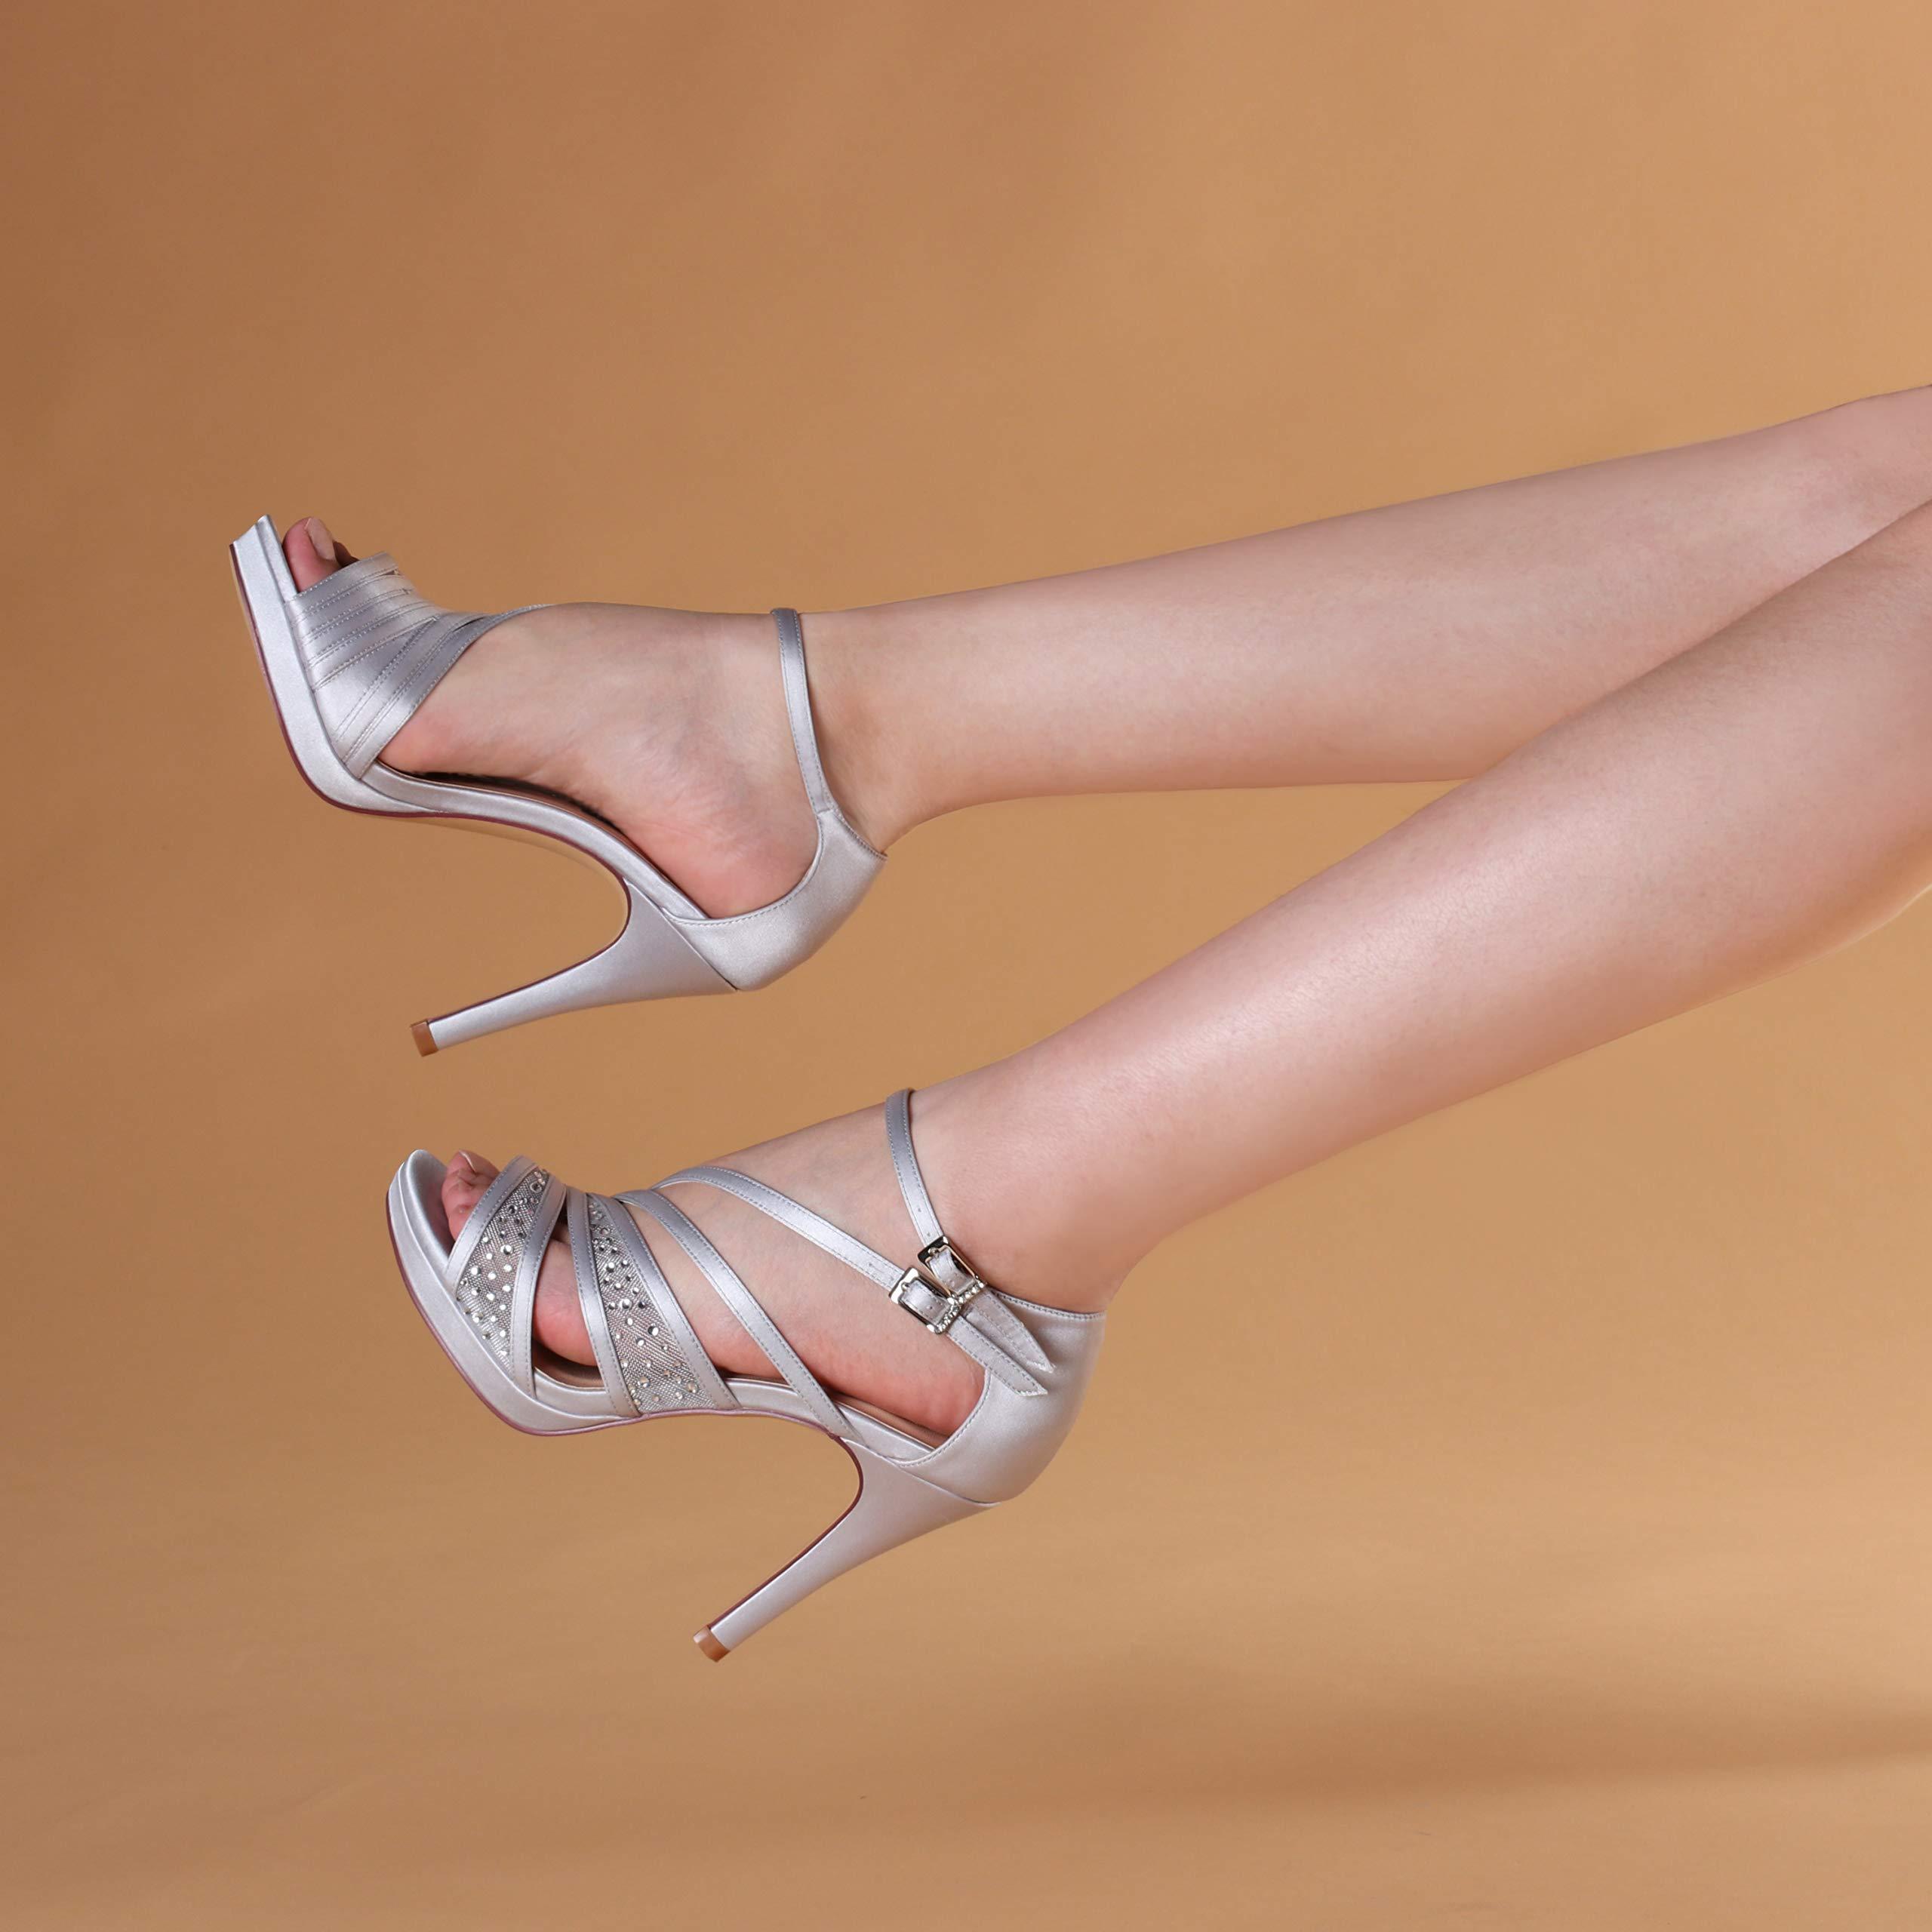 7f374bb4888cf ERIJUNOR E2333A Women Comfortable Platform Rhinestones Lace Mesh Satin Prom  Wedding Shoes Sandals Dance for Brides Bridesmaid Silver Size 5